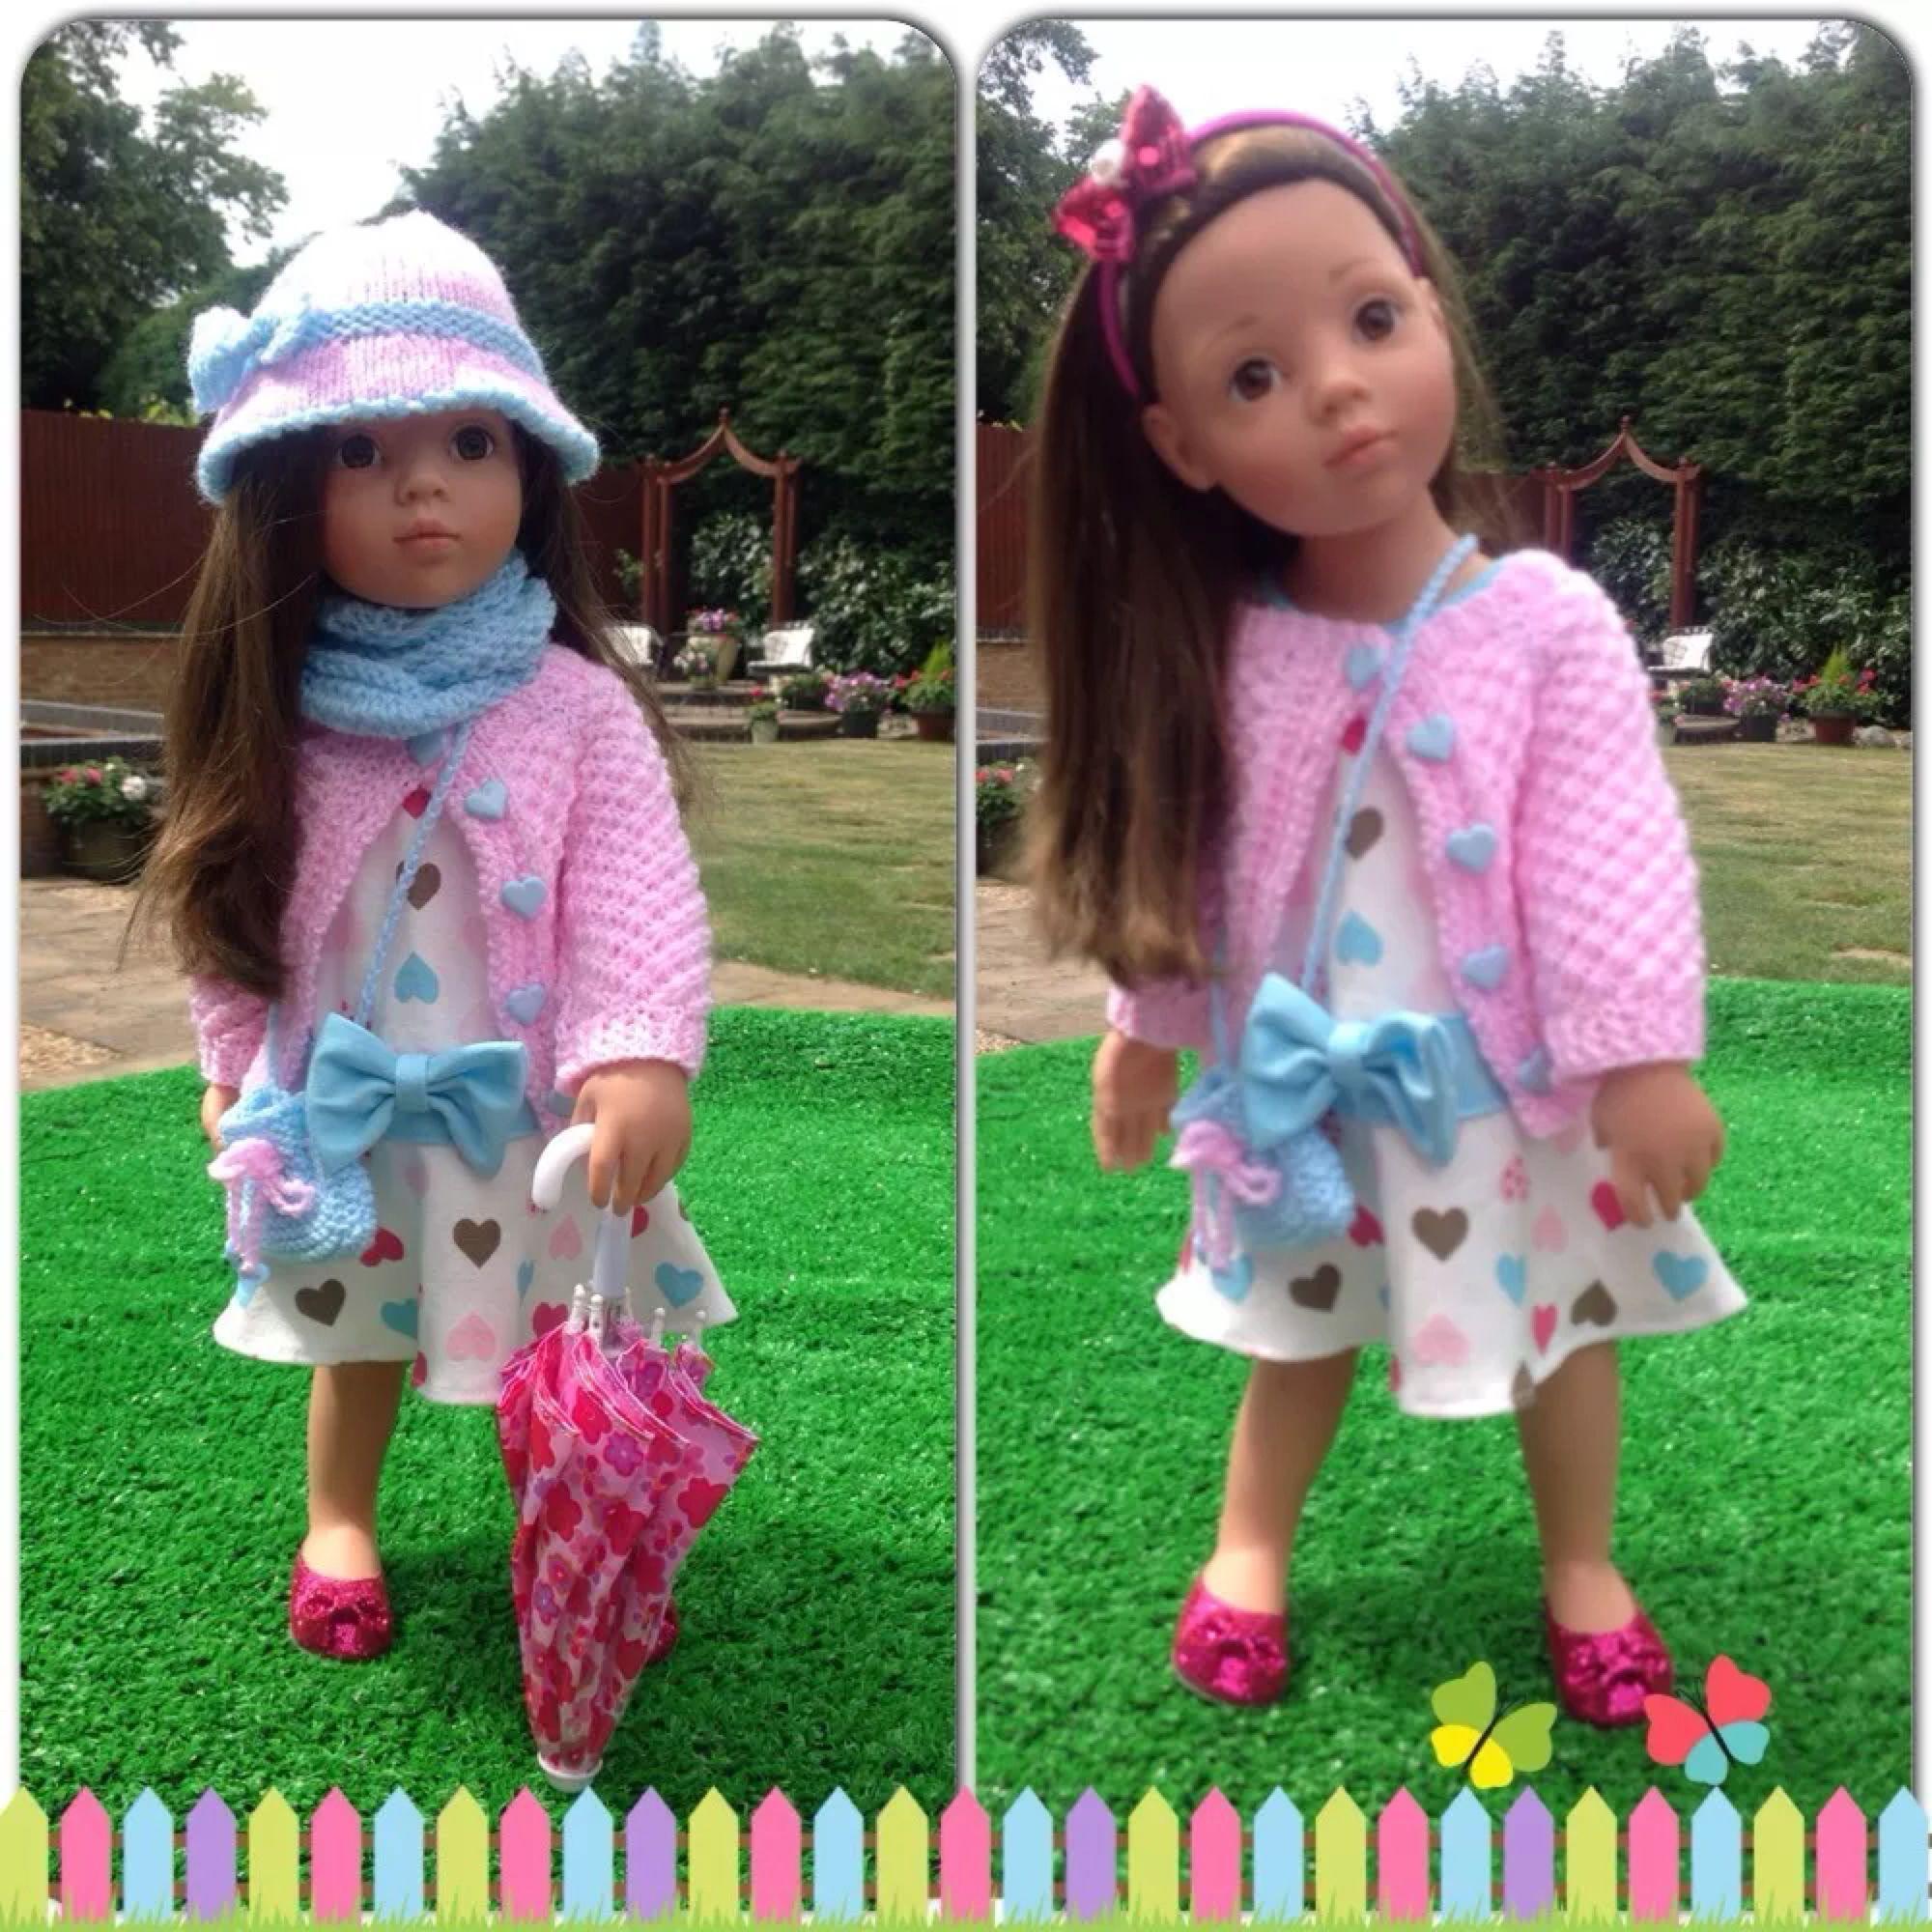 Gotz hannah american girl doll 10 piece outfit | Rund ums Nähen ...